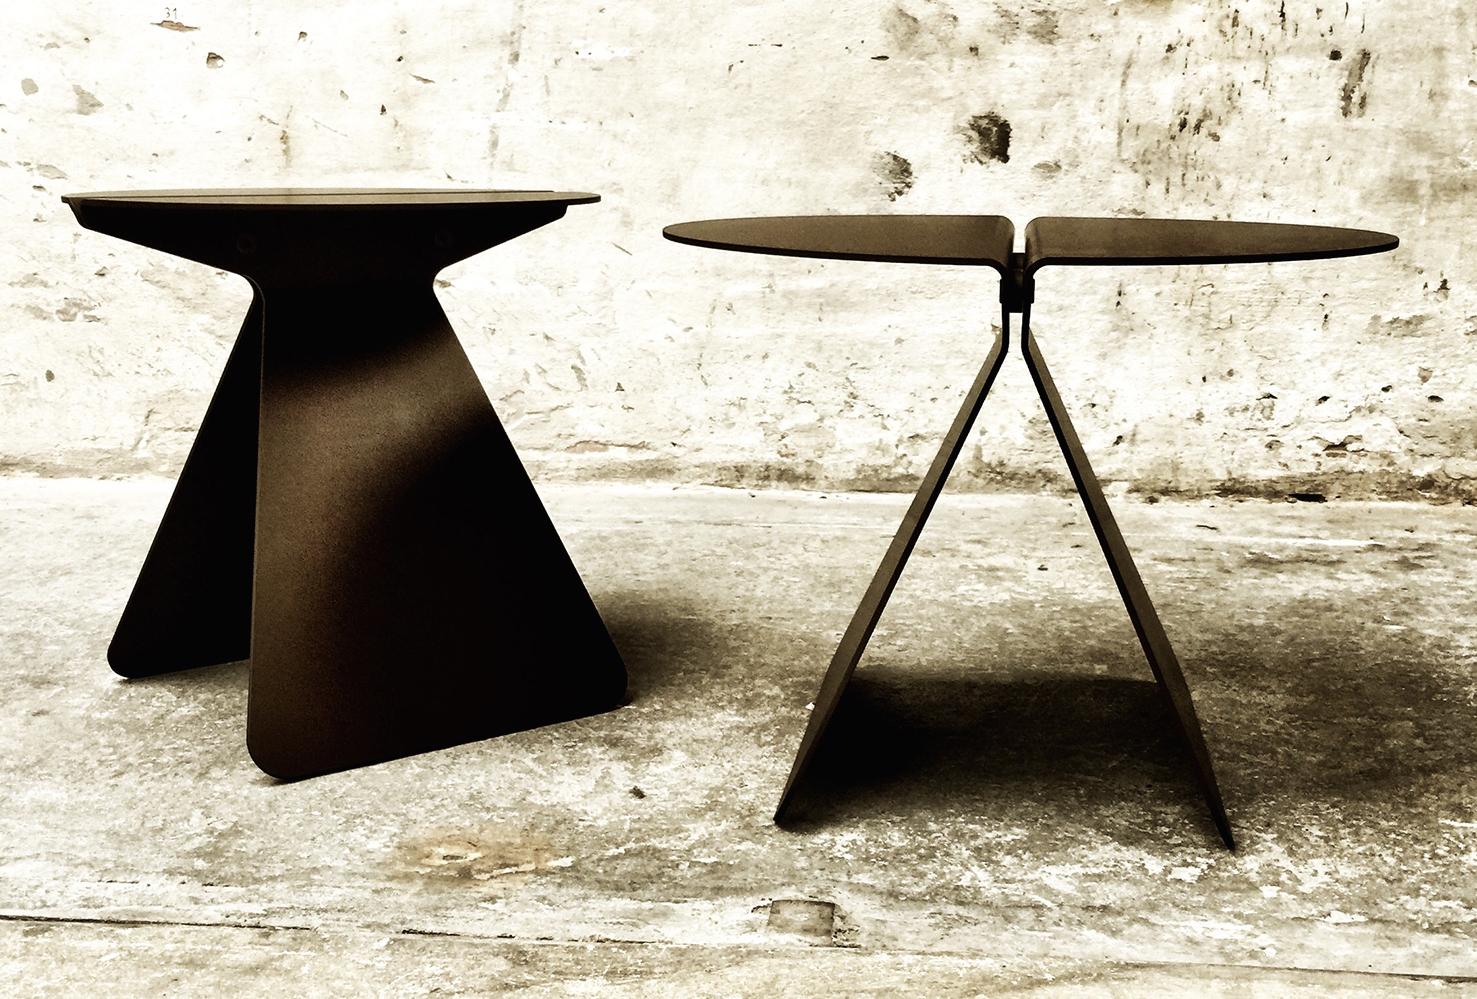 LITTLE WING Side Table by Knudsen/Berg/Hindenes for DK3